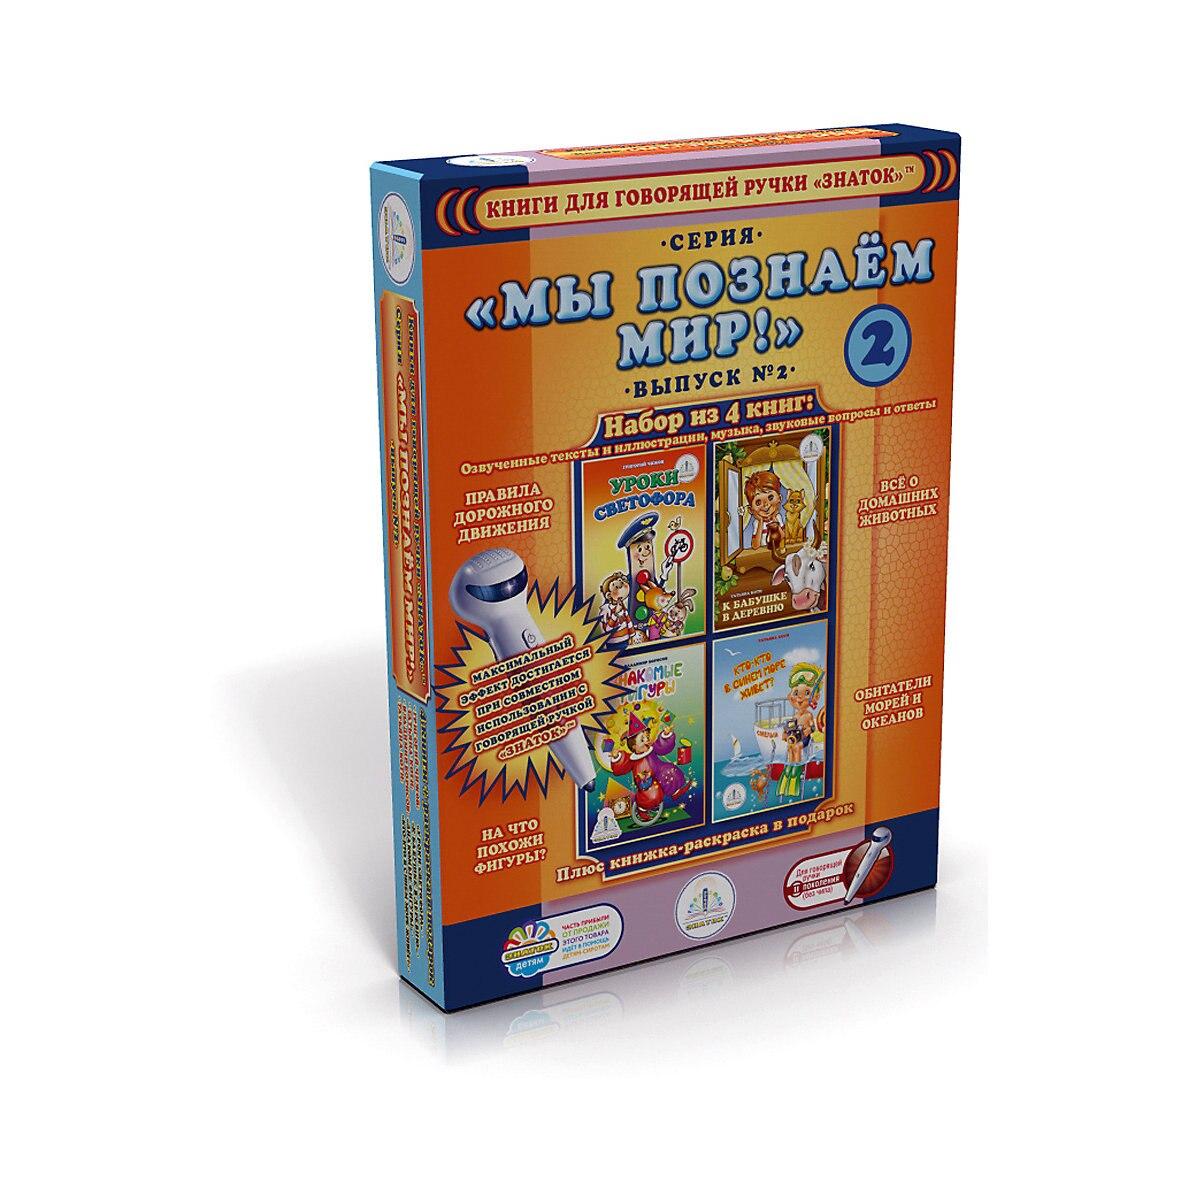 ZNATOK Learning Machine 5296323 educational game interactive toys children toy MTpromo